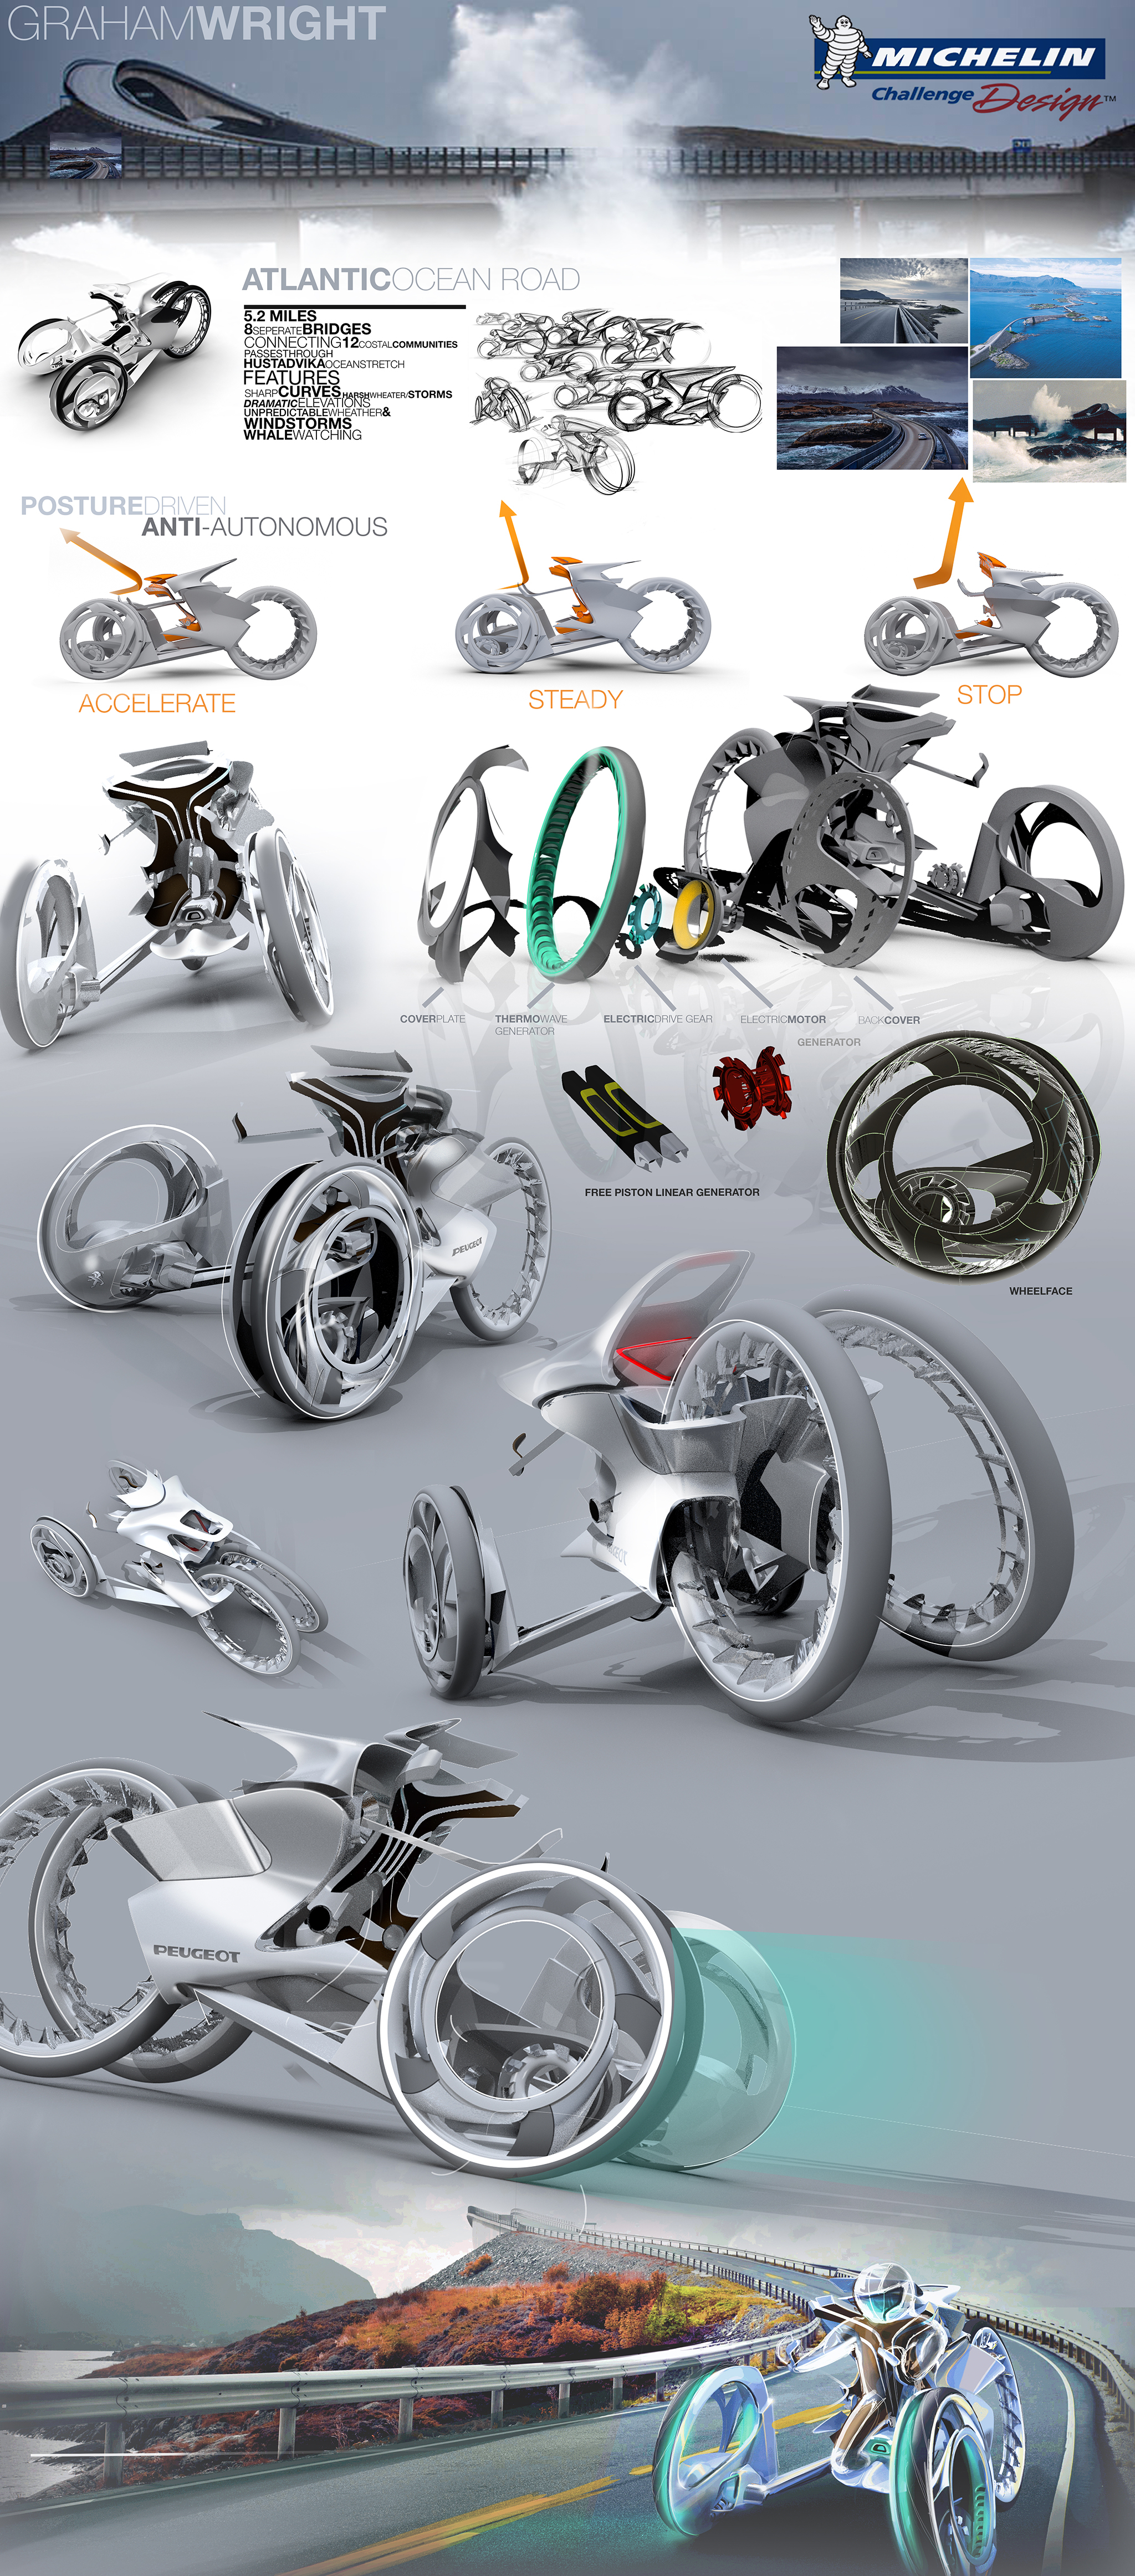 Michelin Announces Winners Of 26th Annual College For Creative Studies Design Competition Michelin Challenge Design